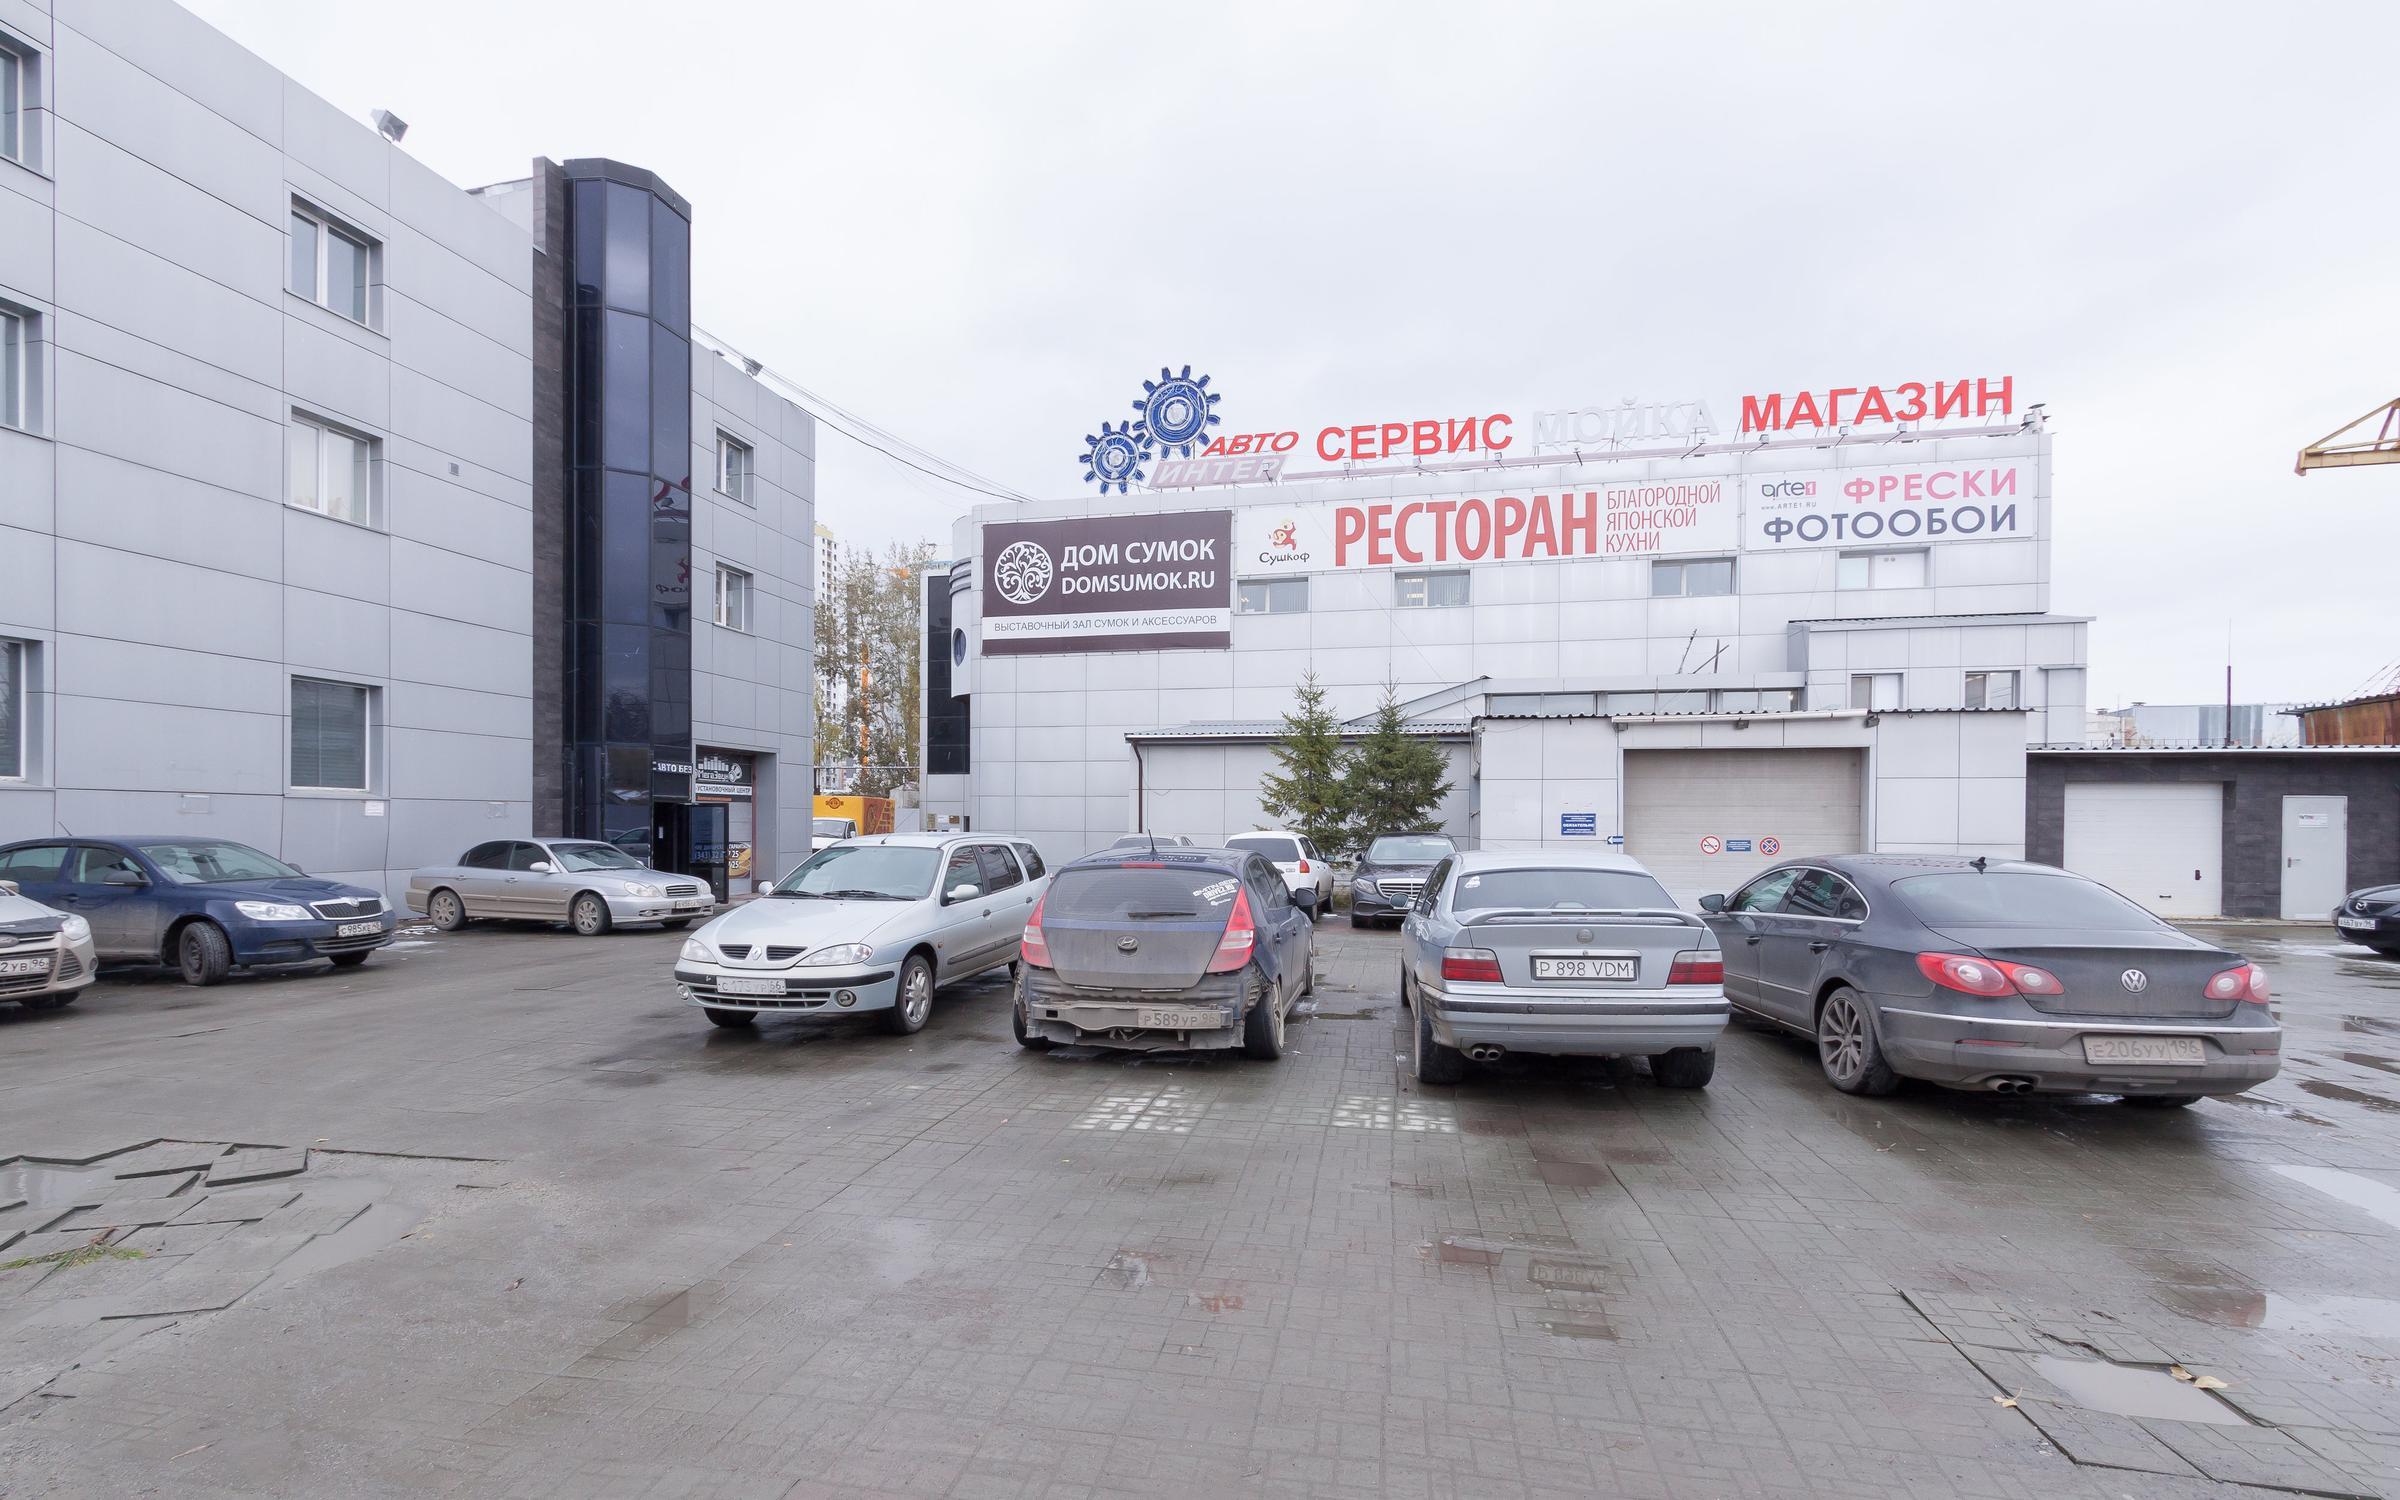 фотография Сервисного центра Авто-Интер на улице 40 лет ВЛКСМ